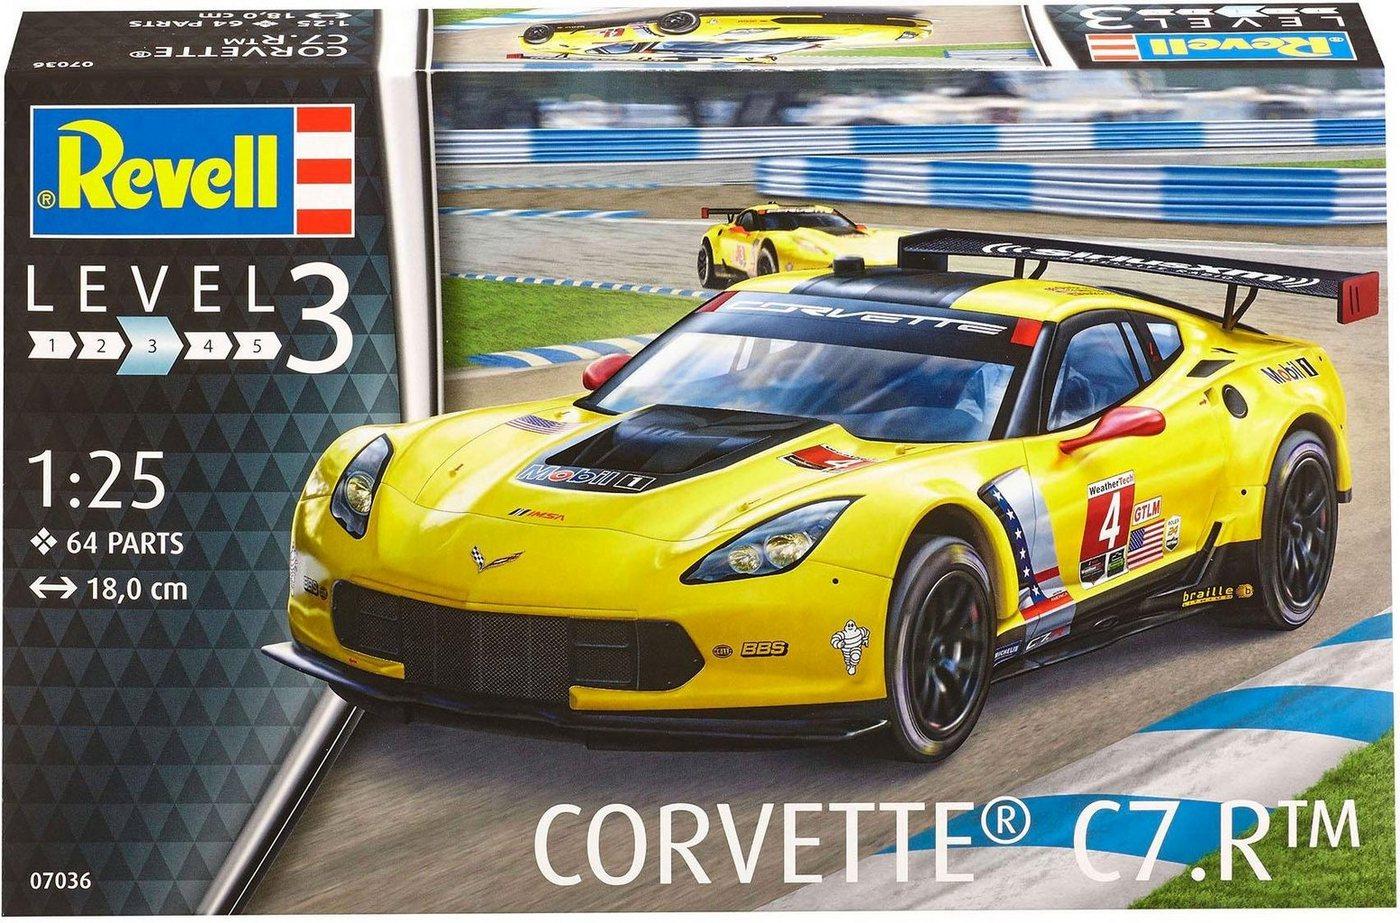 Revell Modellbausatz Auto mit Zubehör Maßstab 1:25, »Model Set Corvette C7.R«